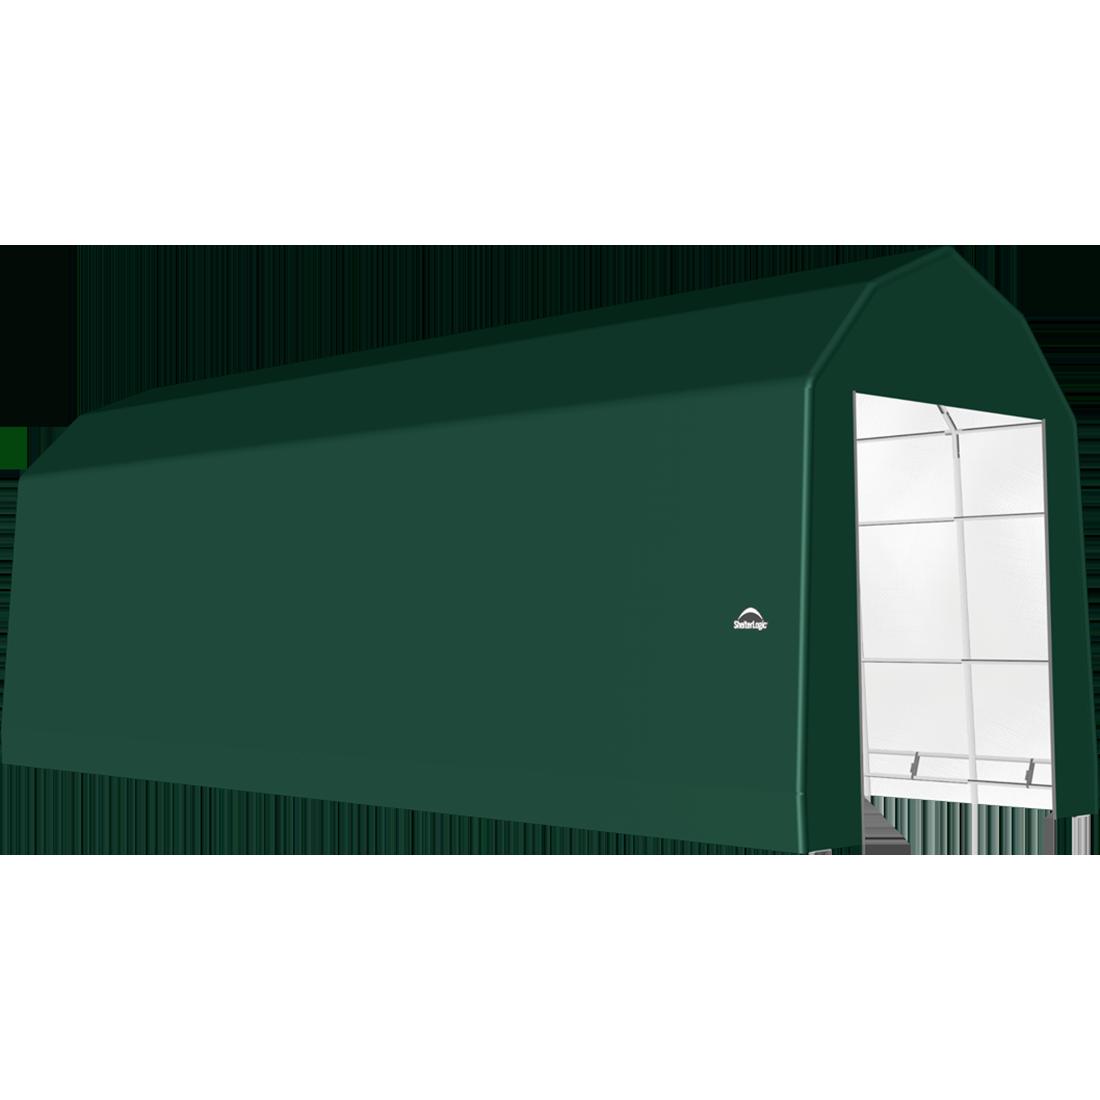 ShelterTech SP Series Barn Shelter, 15 ft. x 48 ft. x 17 ft. Heavy Duty PVC 14.5 oz. Green